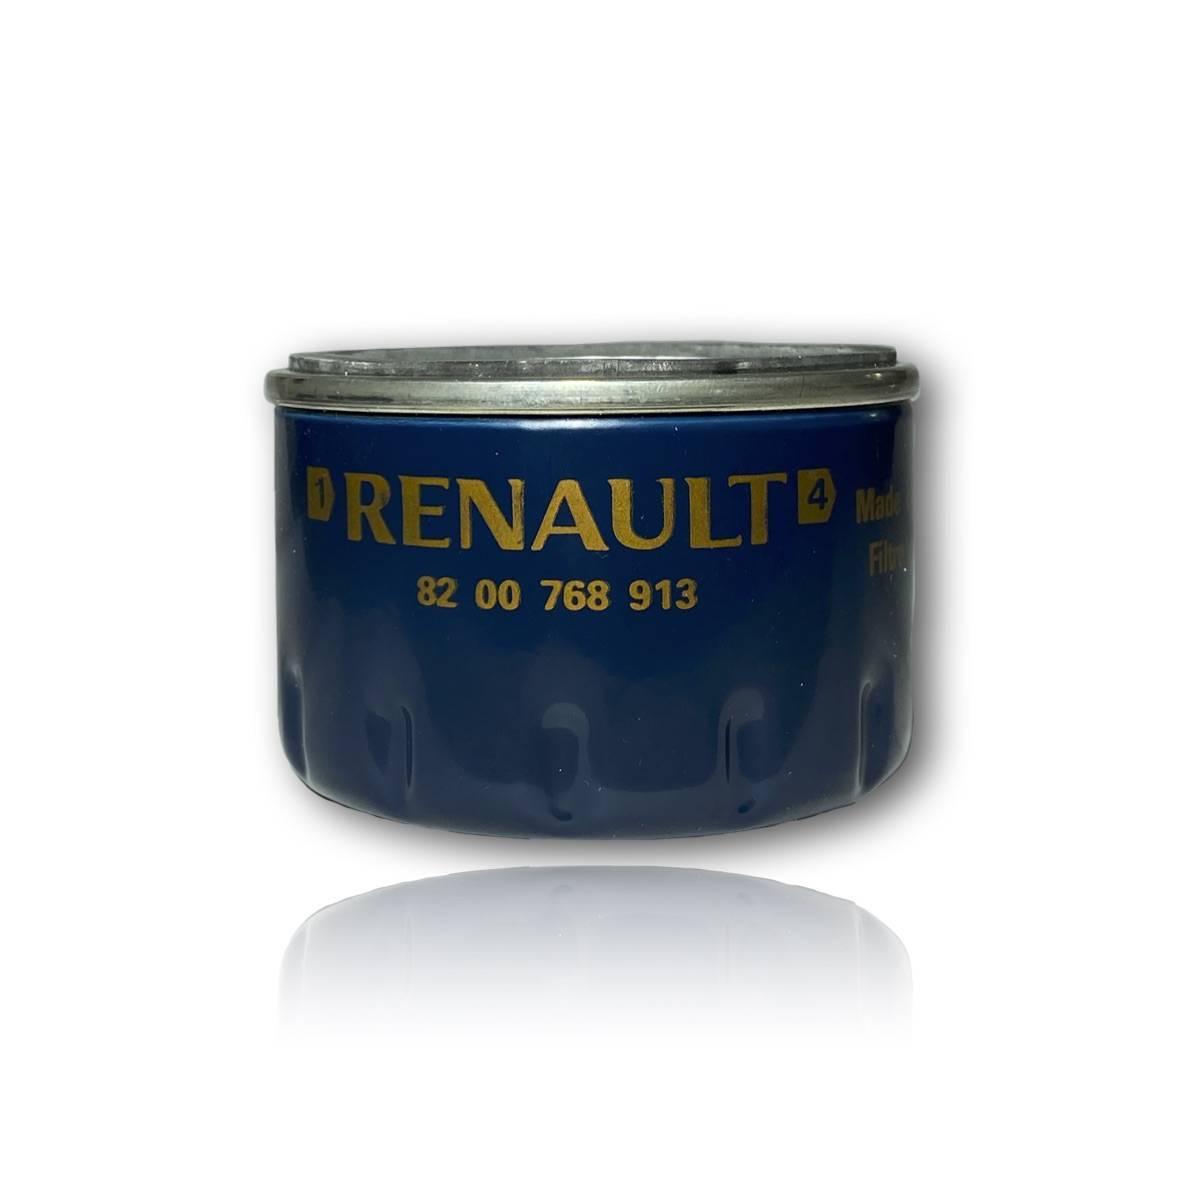 Filtro de óleo do motor - Renault motor F4R - 82 00 768 913 - PerformanceLUB Lubrificantes Premium